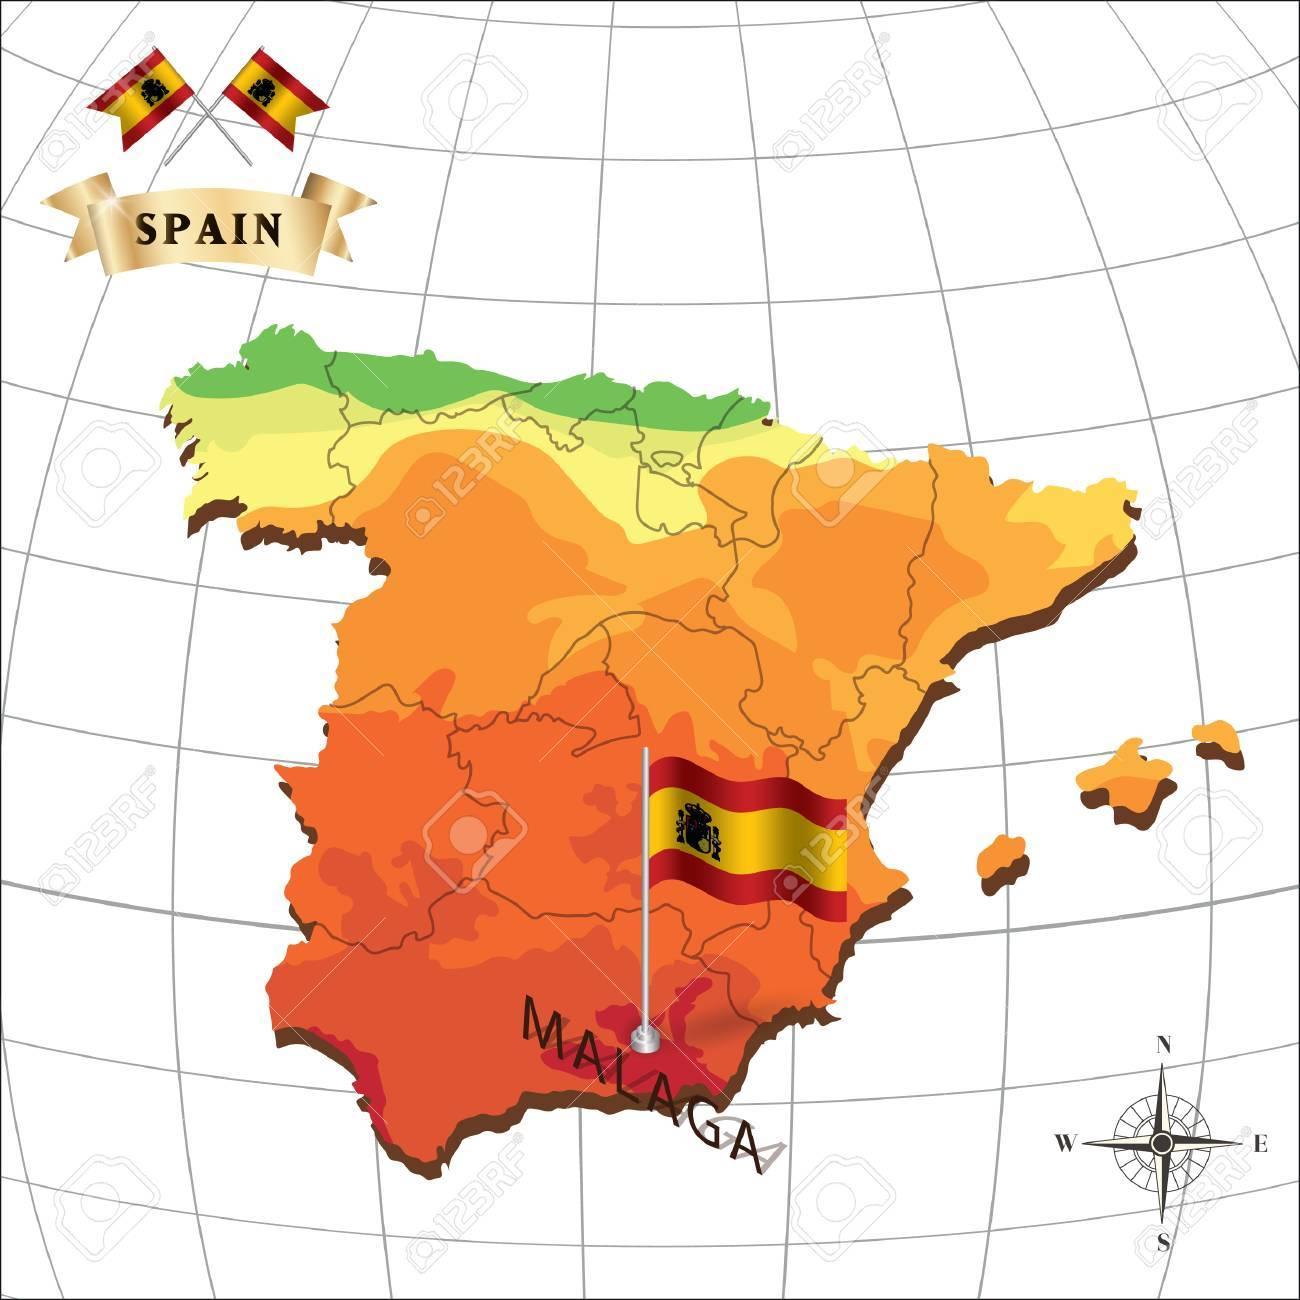 Resultado de imagen de malaga mapa españa